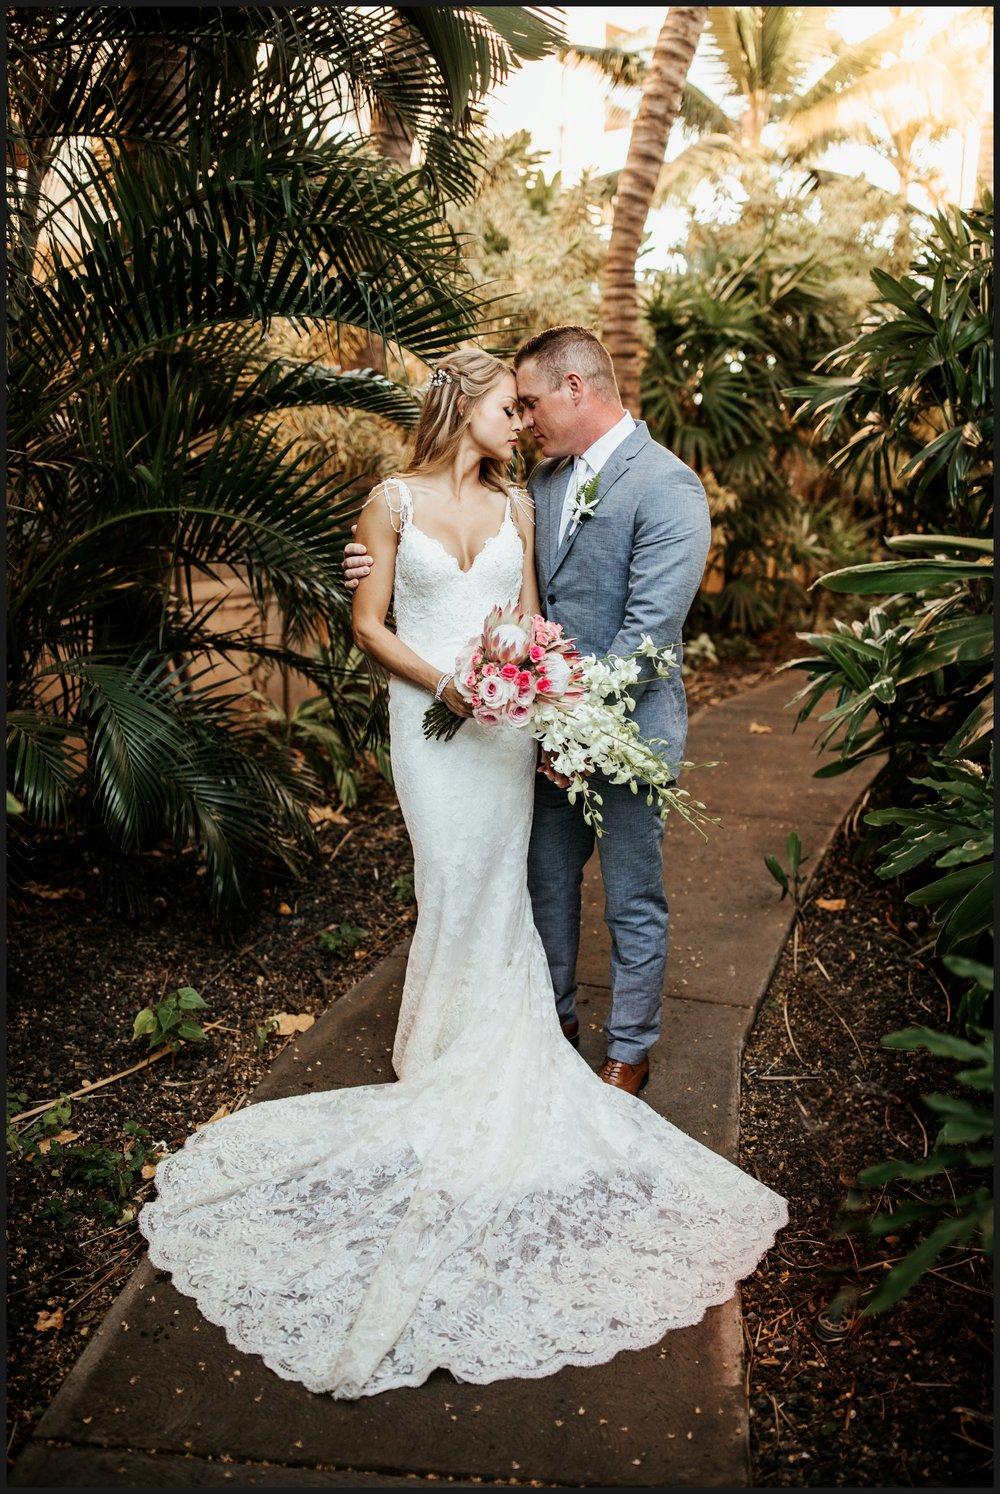 Orlando-Wedding-Photographer-destination-wedding-photographer-florida-wedding-photographer-hawaii-wedding-photographer_0076.jpg